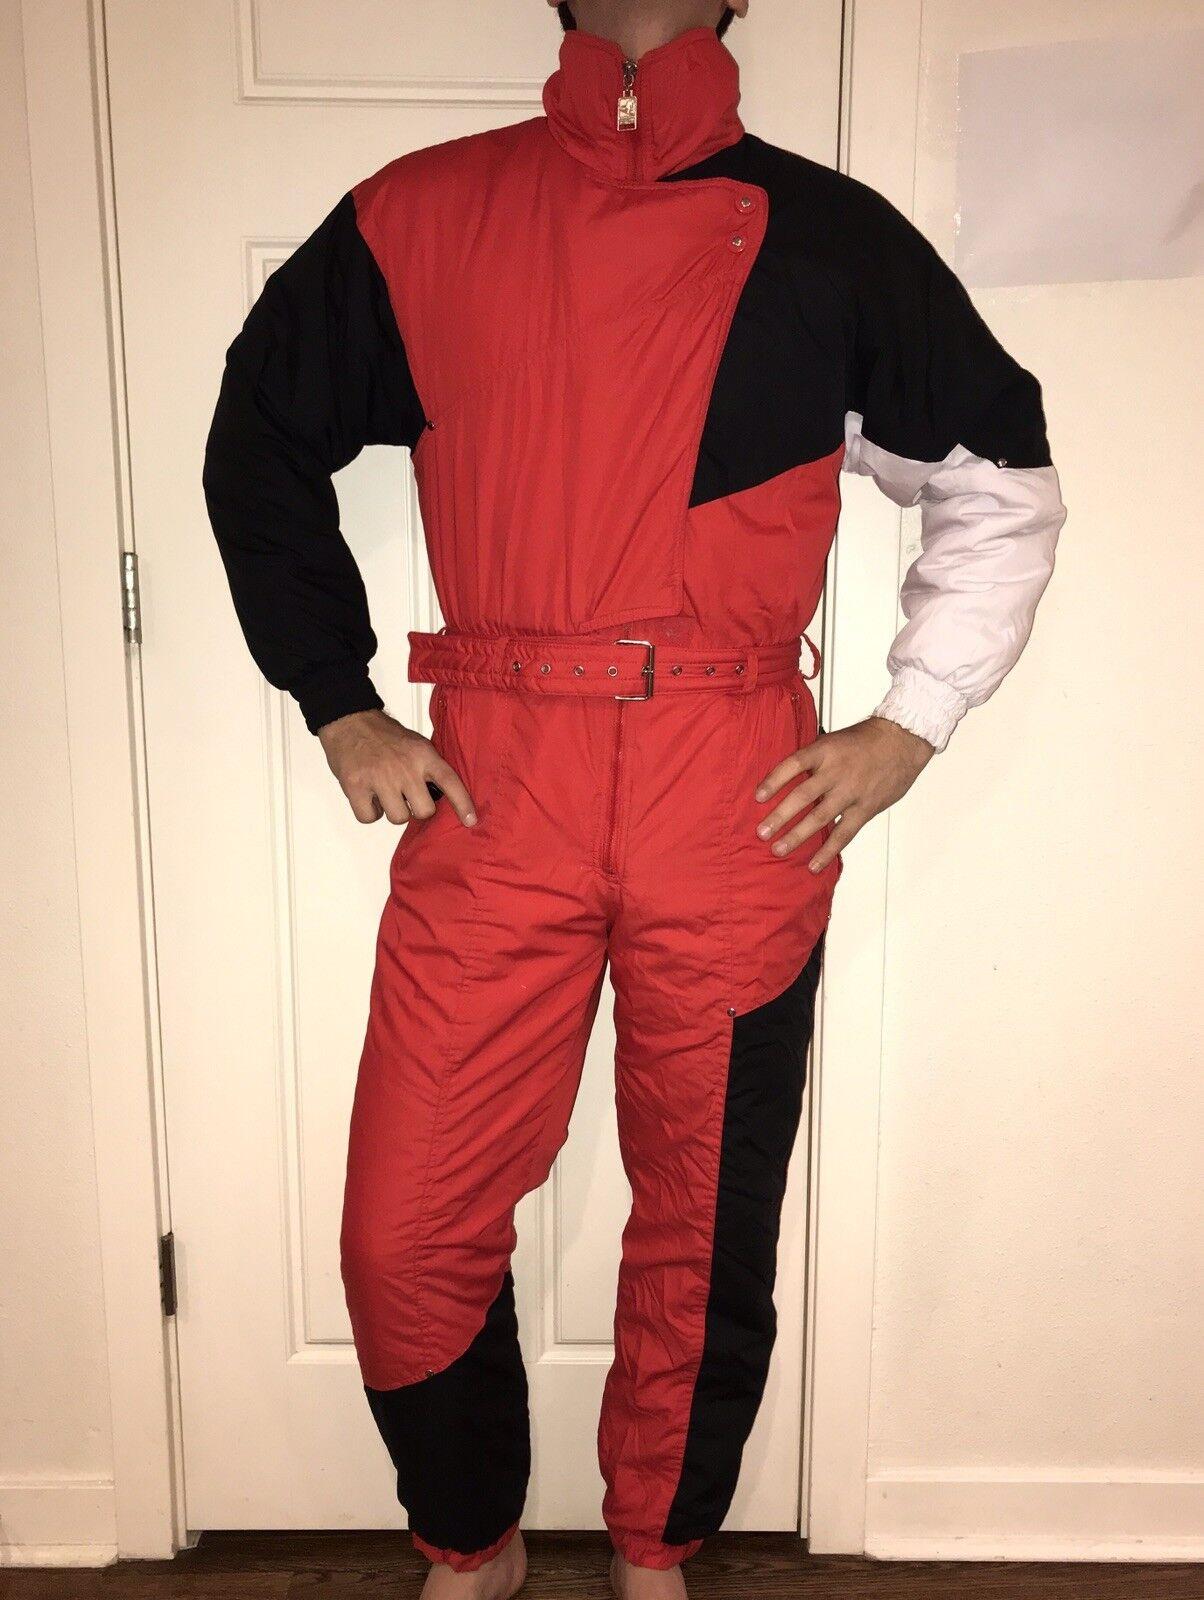 Vtg 80s Red SKI GEAR Womens MEDIUM One Piece  Apres SKI SUIT Snow Bib Snowsuit  save up to 30-50% off